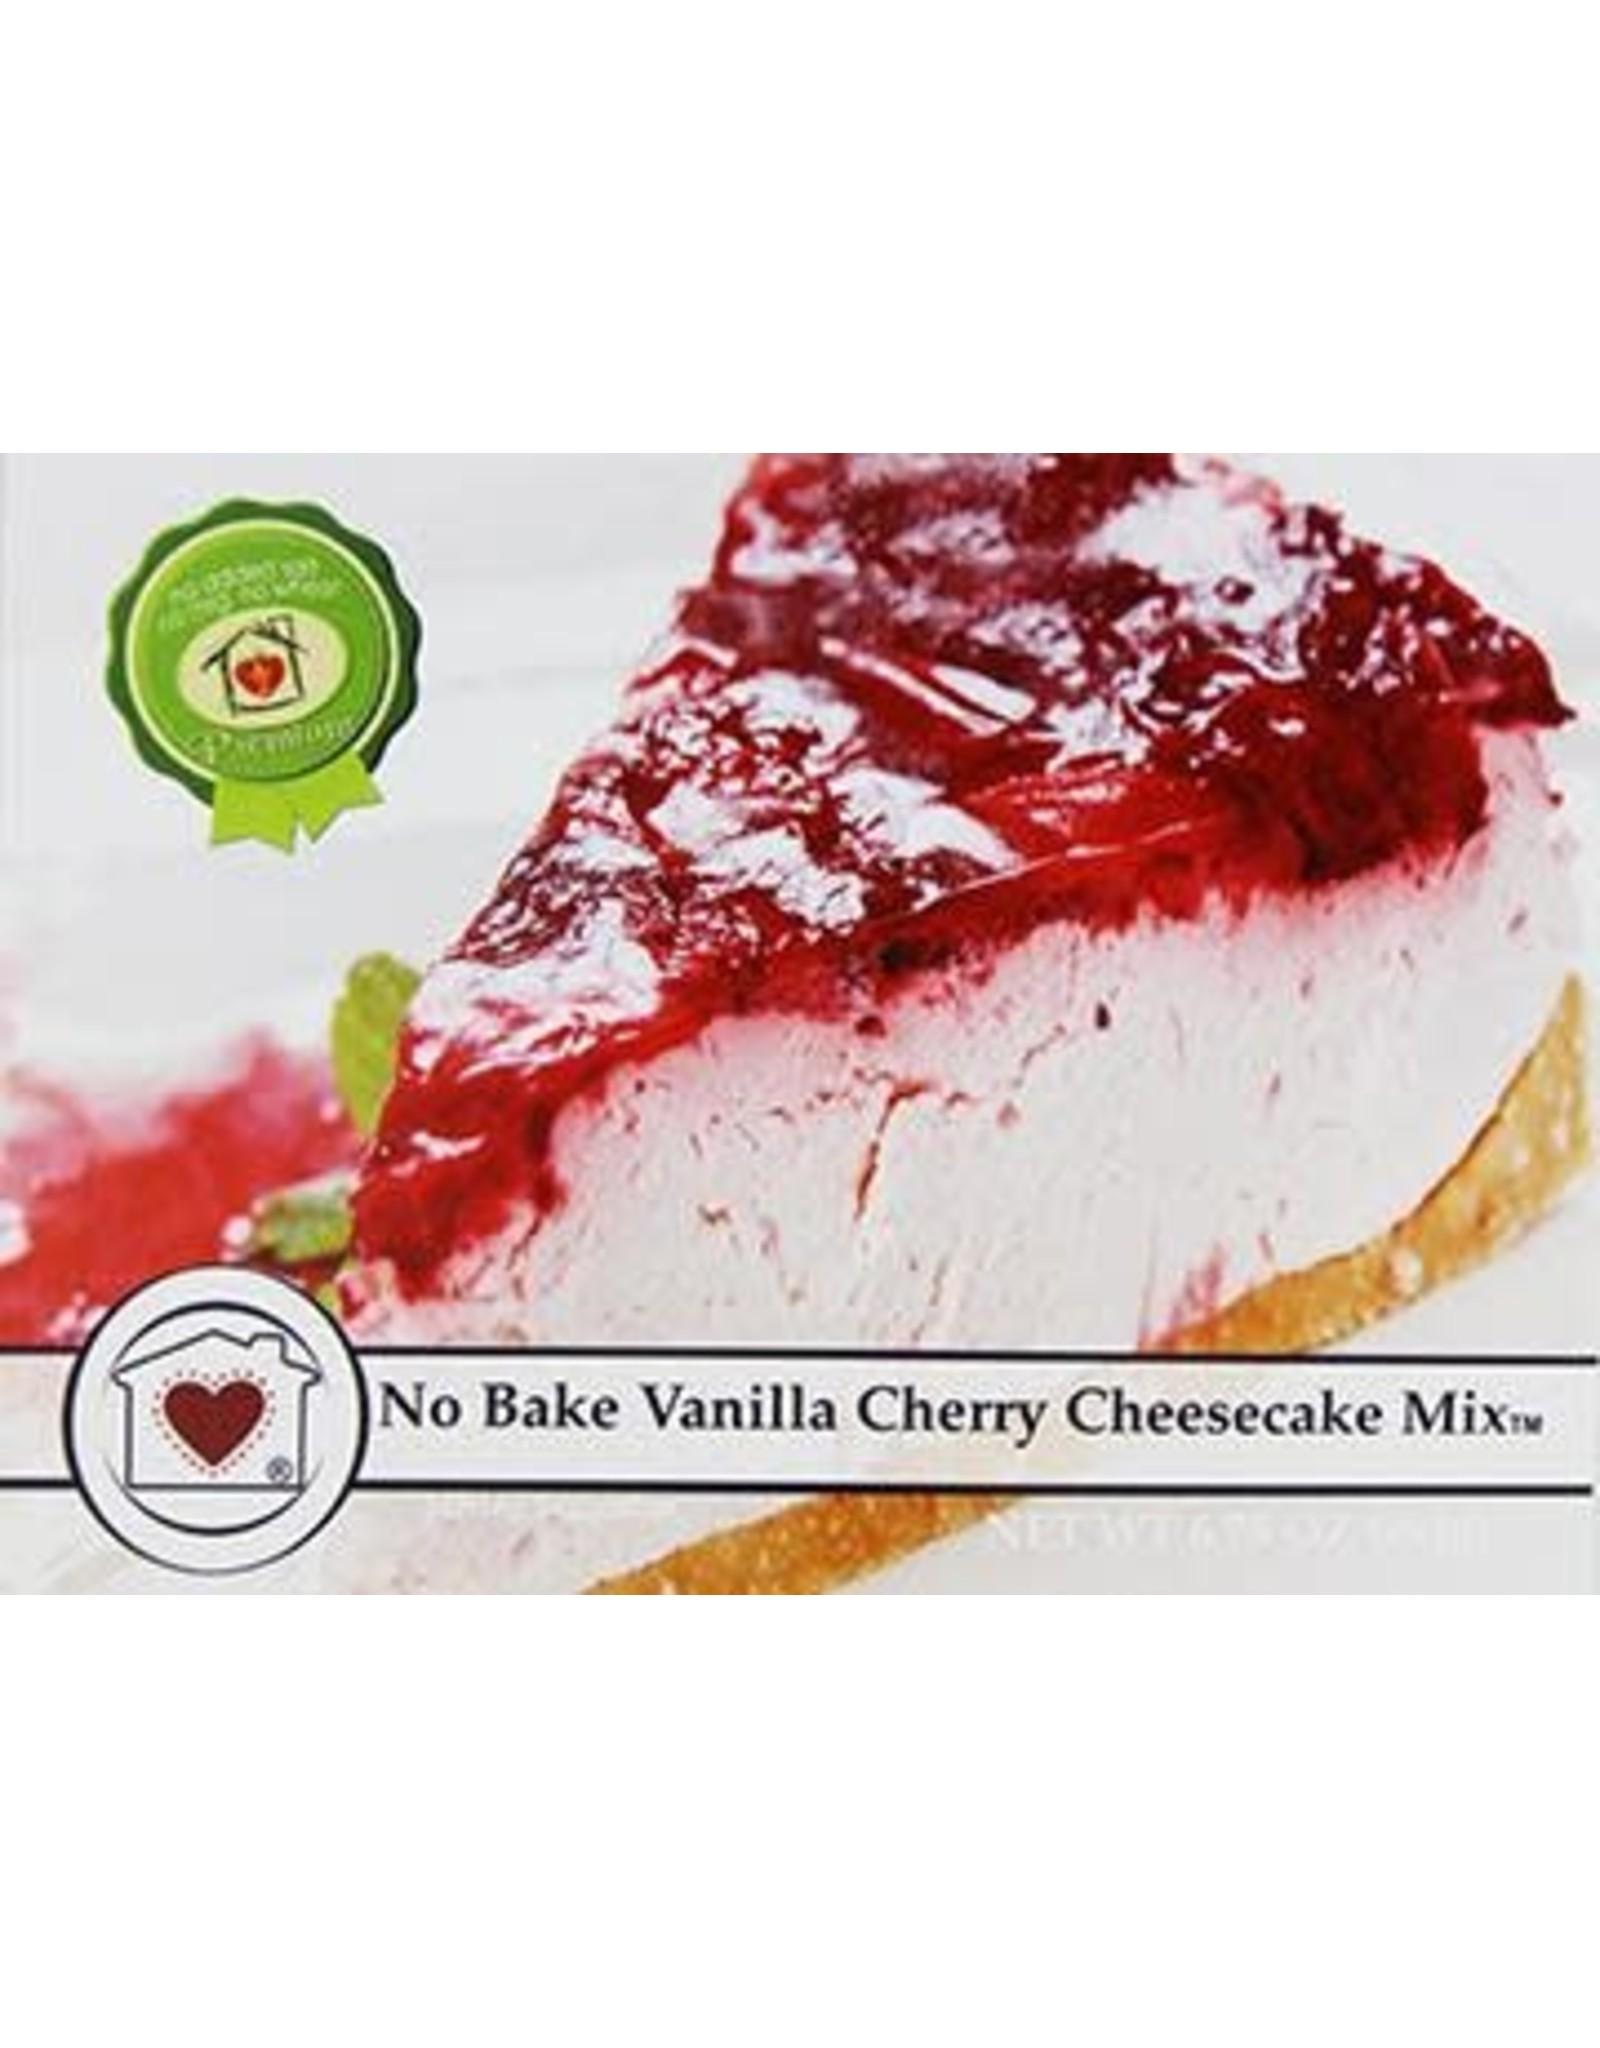 Country Home Creations No Bake Vanilla Cherry Cheesecake Mix, 6.75 oz